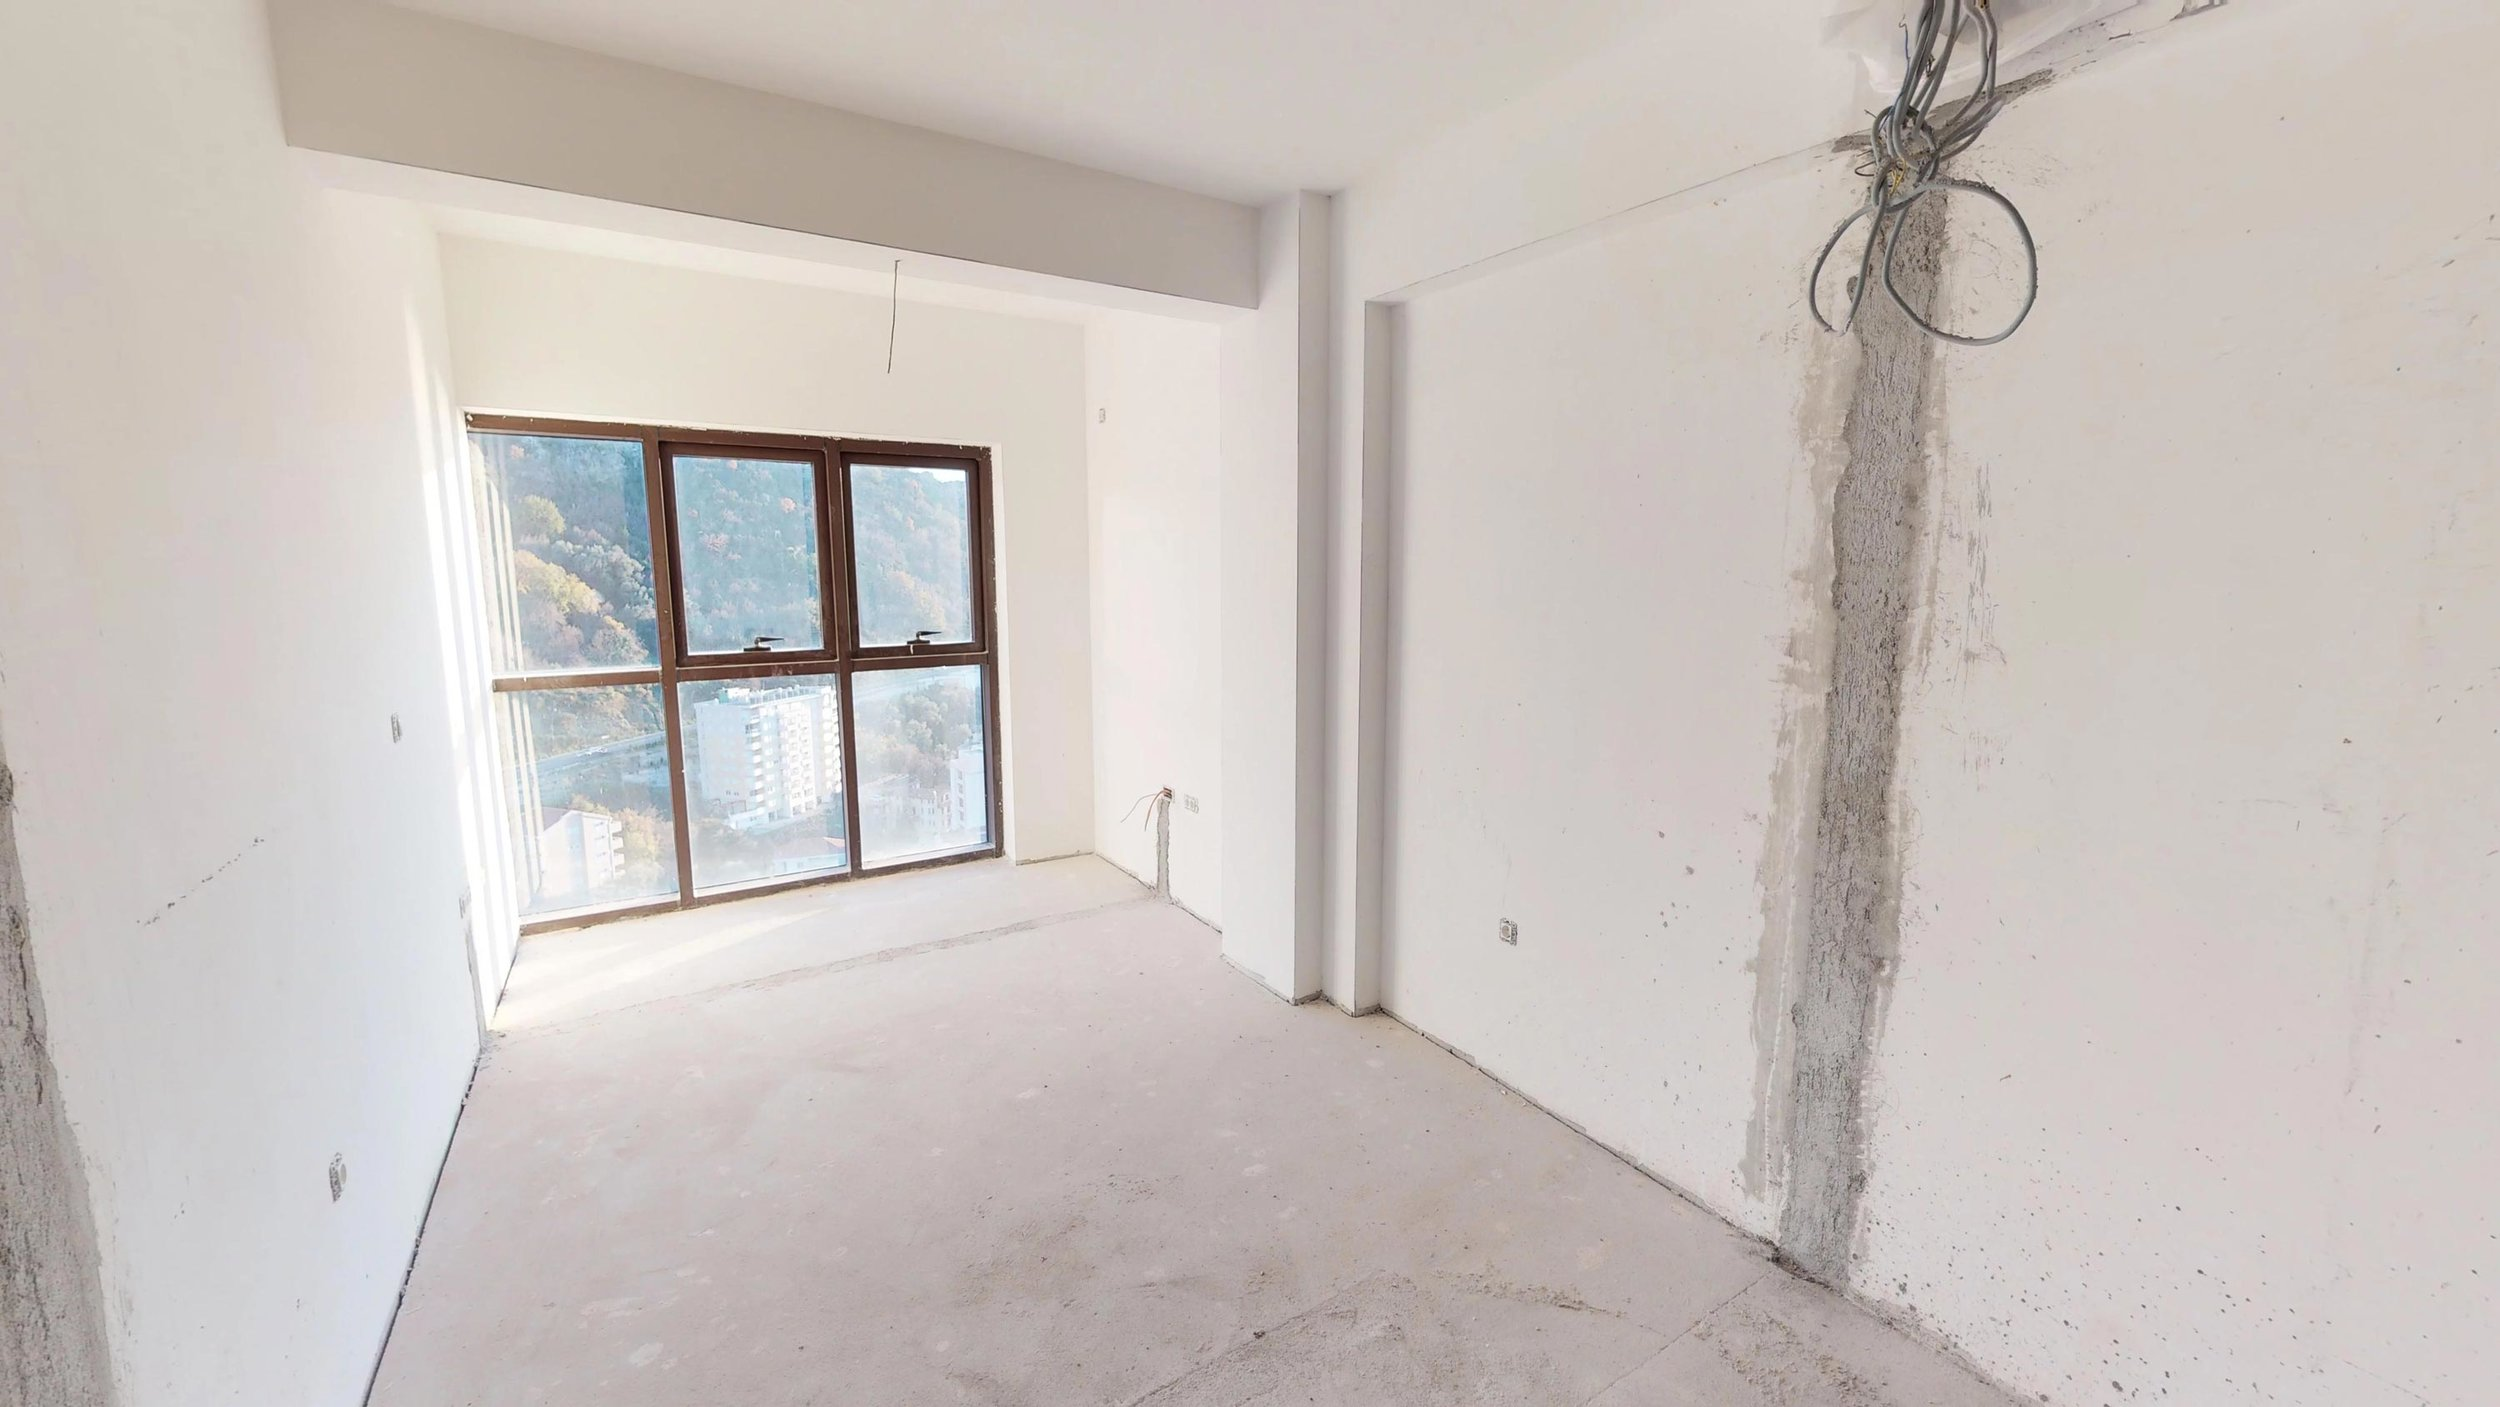 Penthouse-for-sale-in-rafailovice-Montenegro-(5).jpg